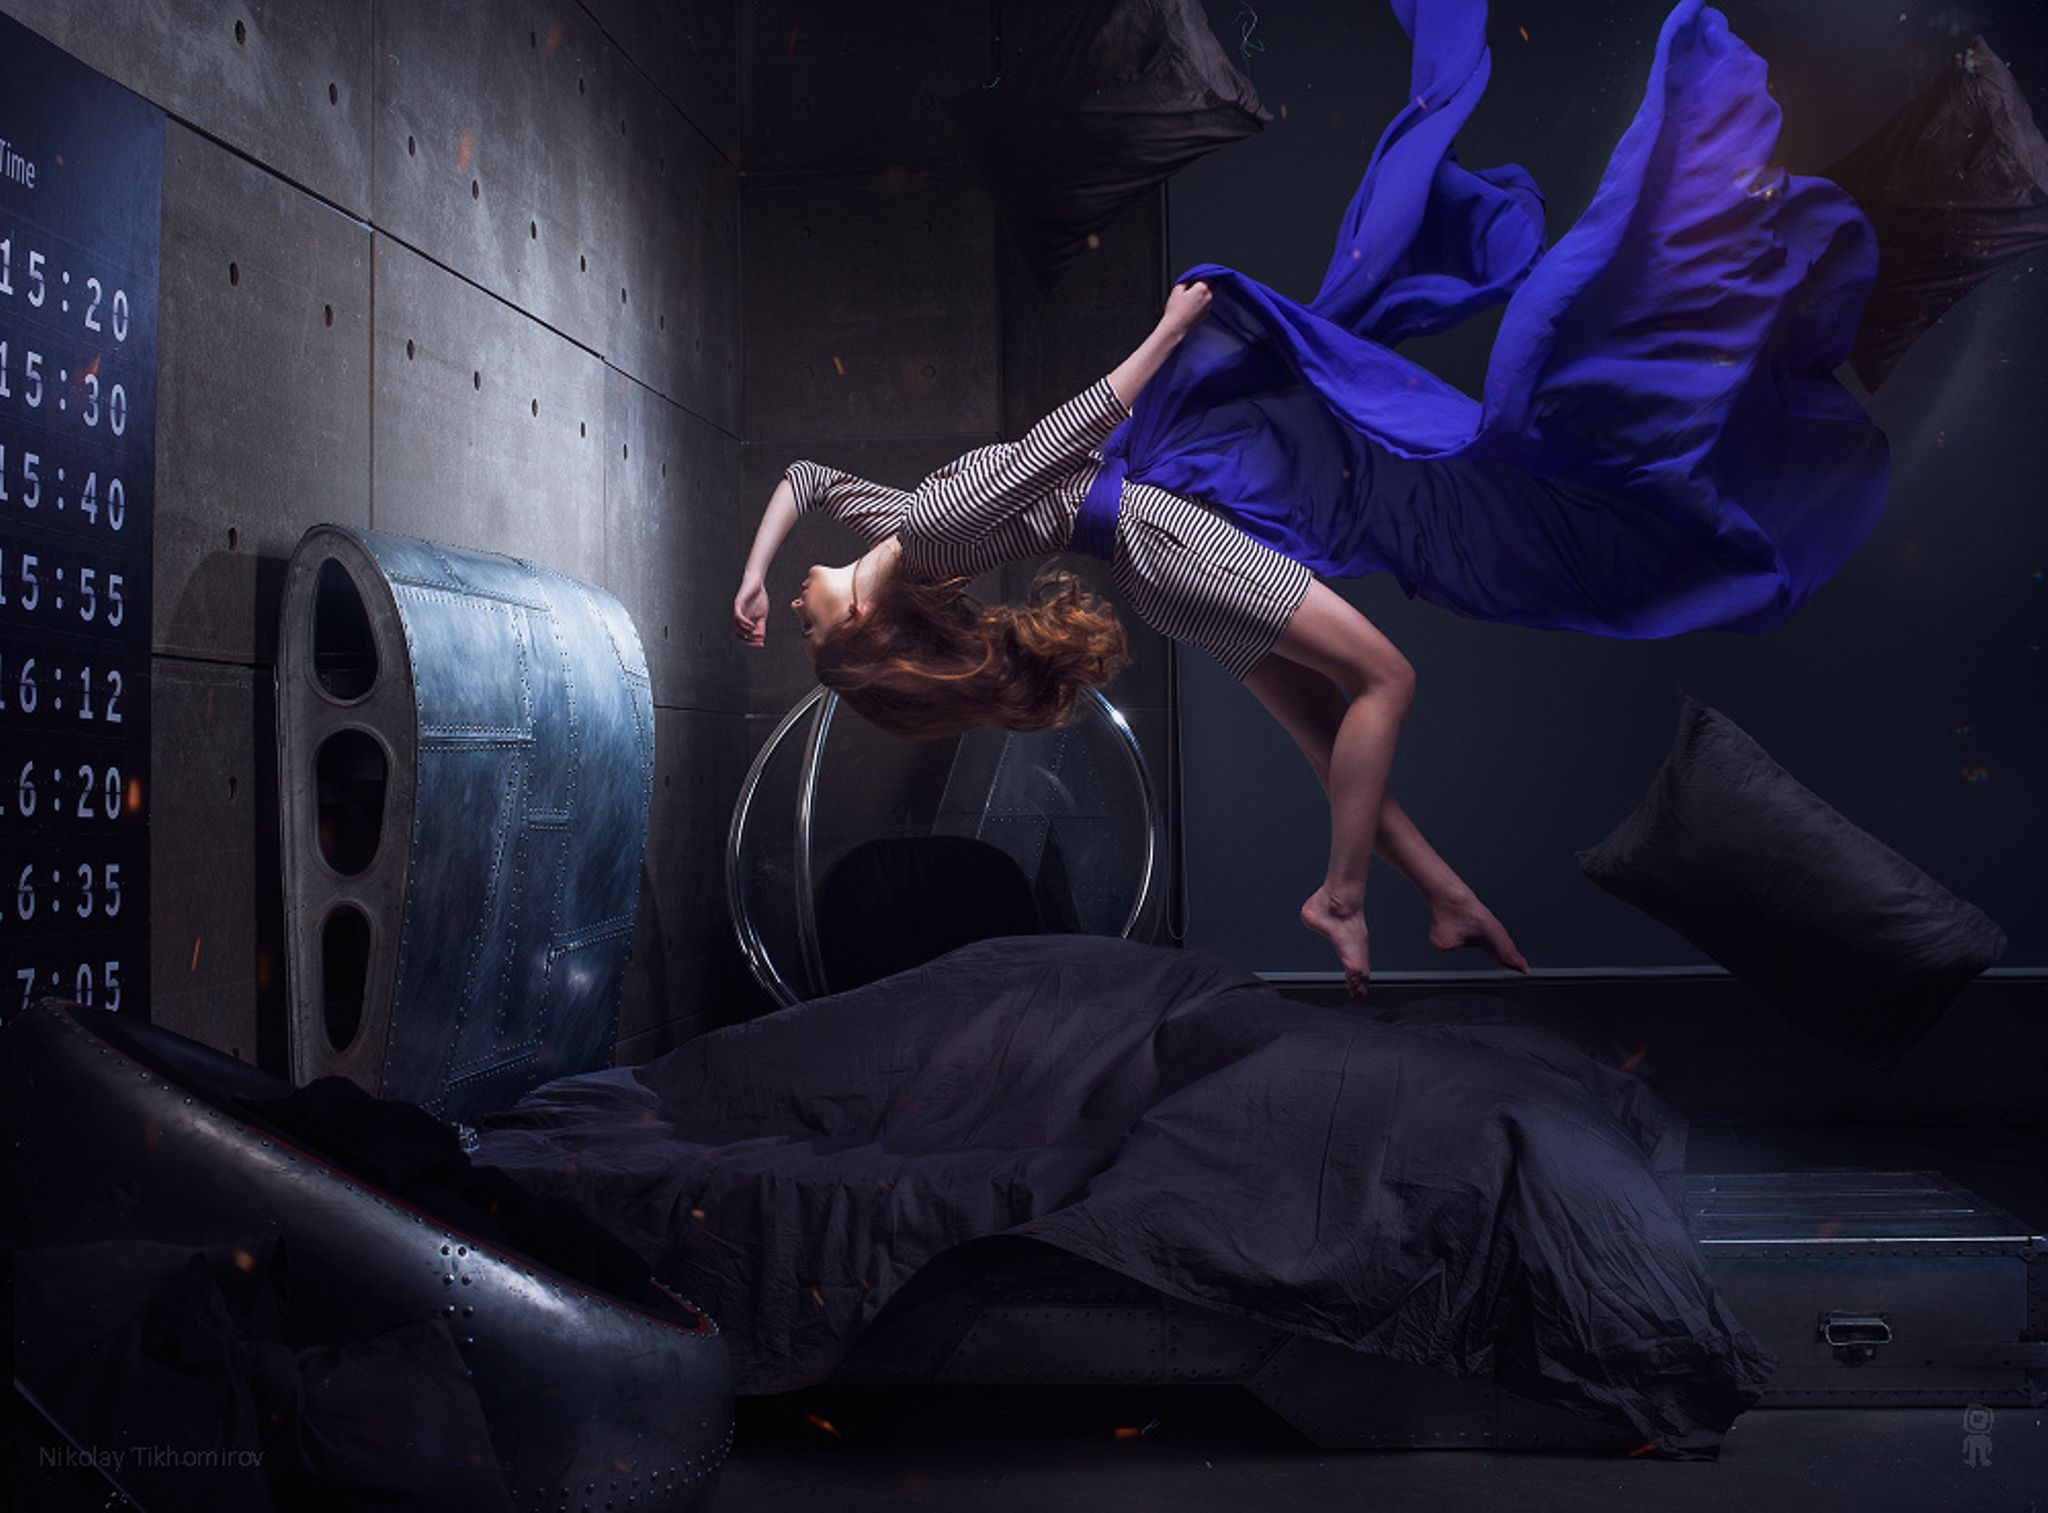 Dream by Nikolay Tikhomirov on 500px | Dream, Royal queen